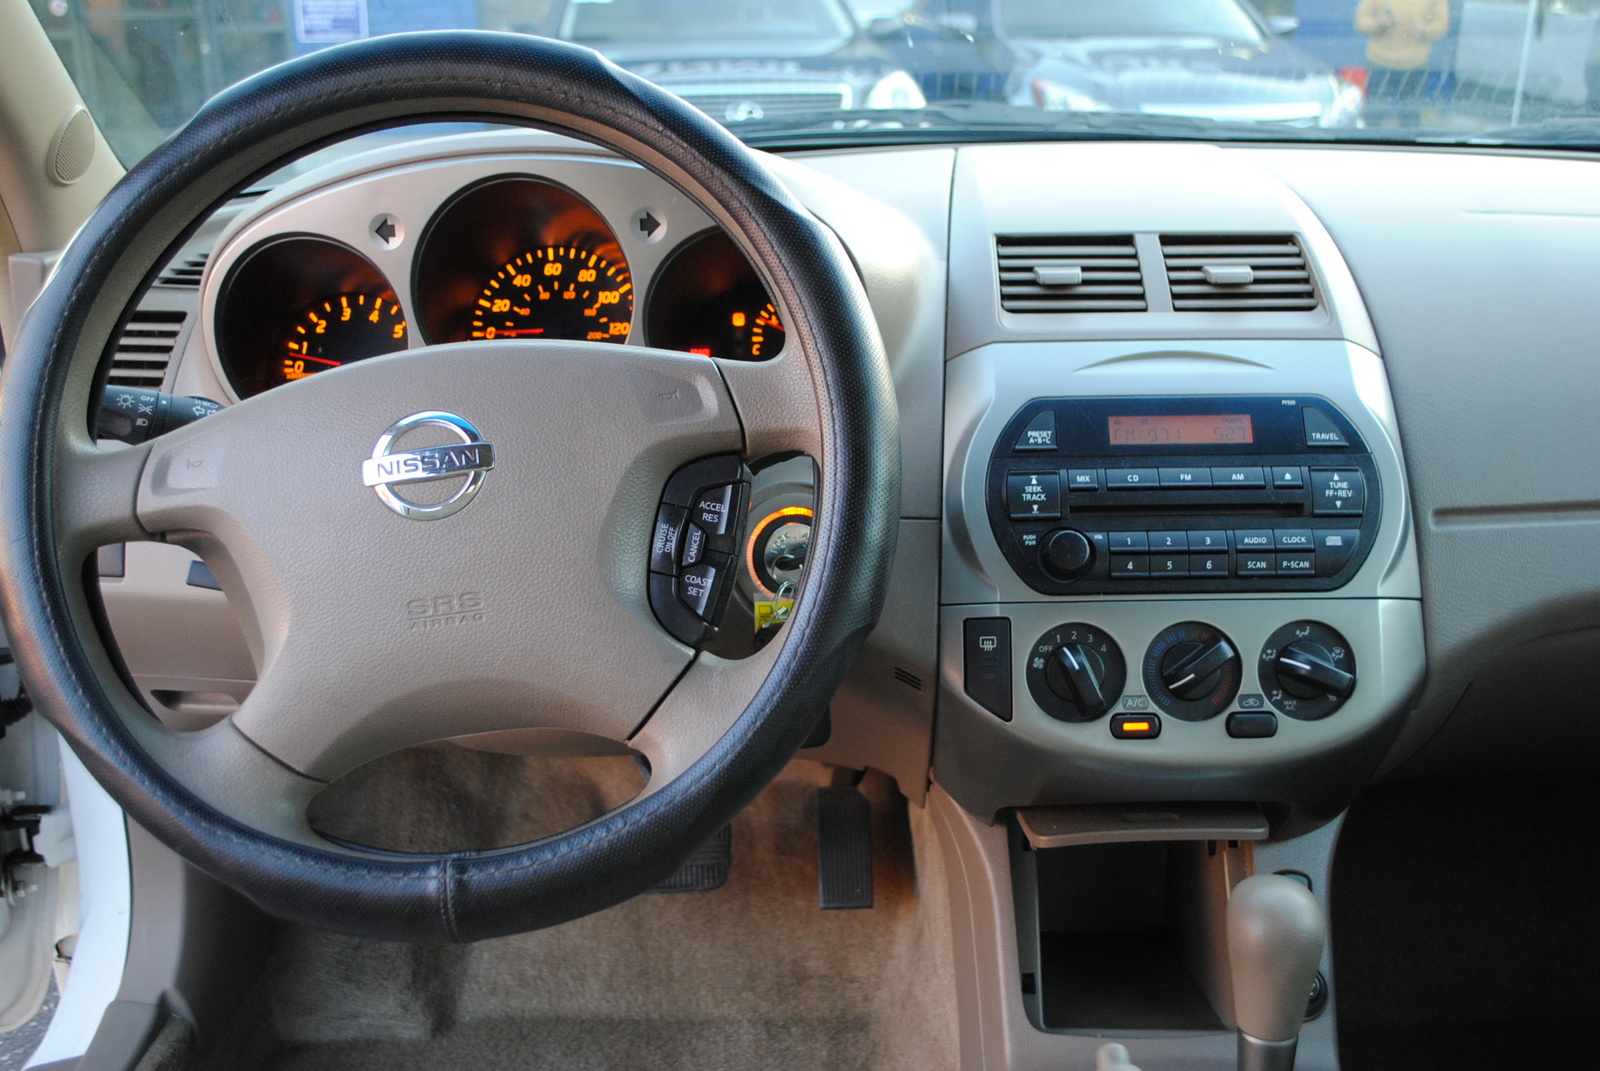 Nissan Altima 2004 Interior